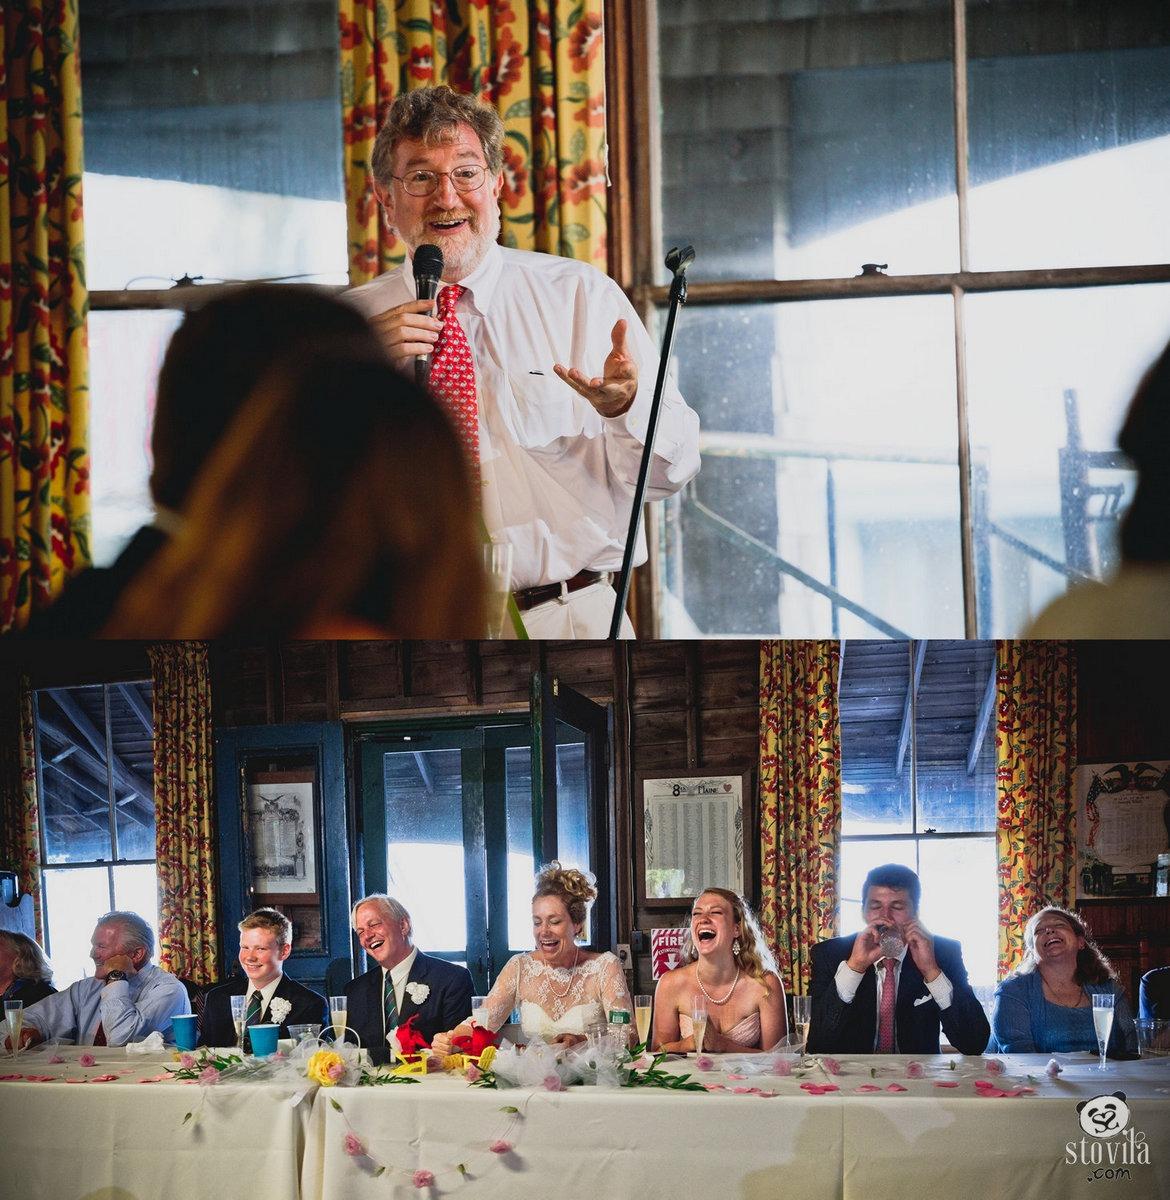 Peak_Island_Maine_Wedding_Jeff_&_Joanie_Stovila (13)